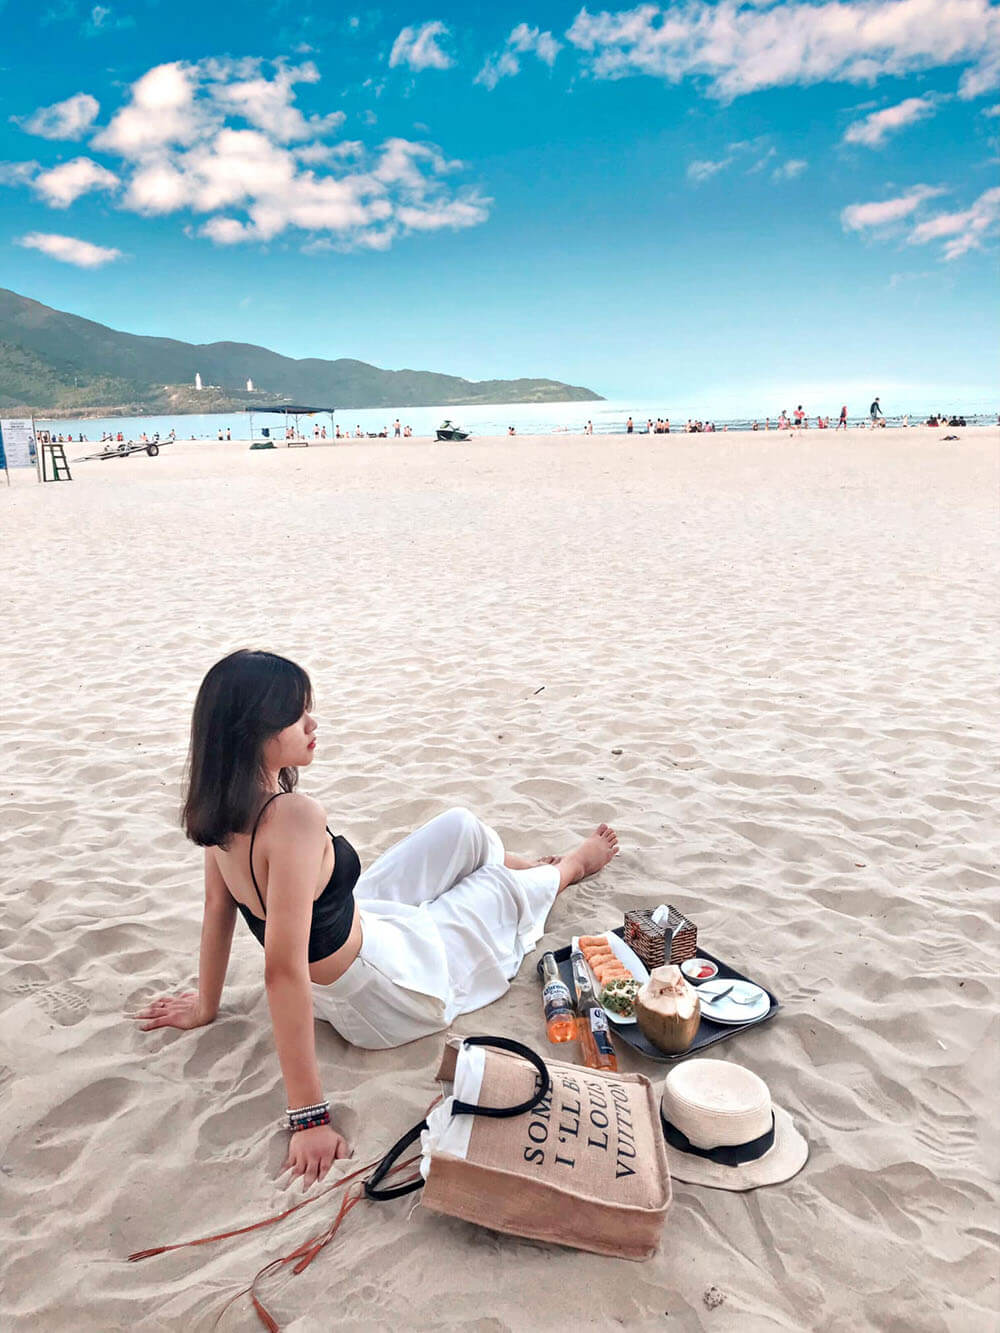 Bien Danang Review Chuyen Du Lich Hoi An Da Nang Chanh Sa 3n2d